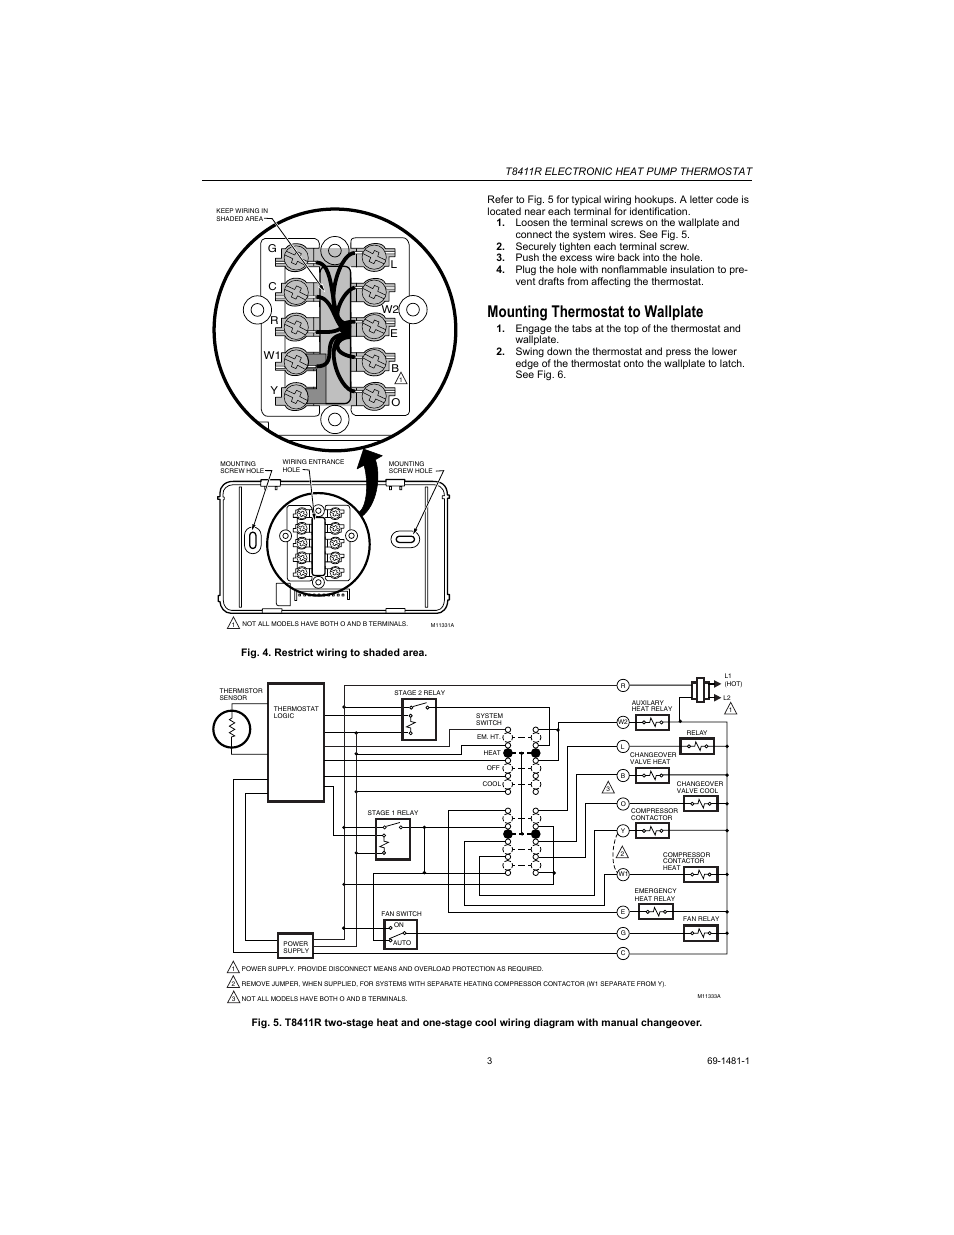 honeywell heat pump thermostat t8411r page3?resize\\\\\\\=665%2C861 trane heat pump wiring diagram & carrier rooftop units wiring honeywell t8411r thermostat wiring diagram at alyssarenee.co